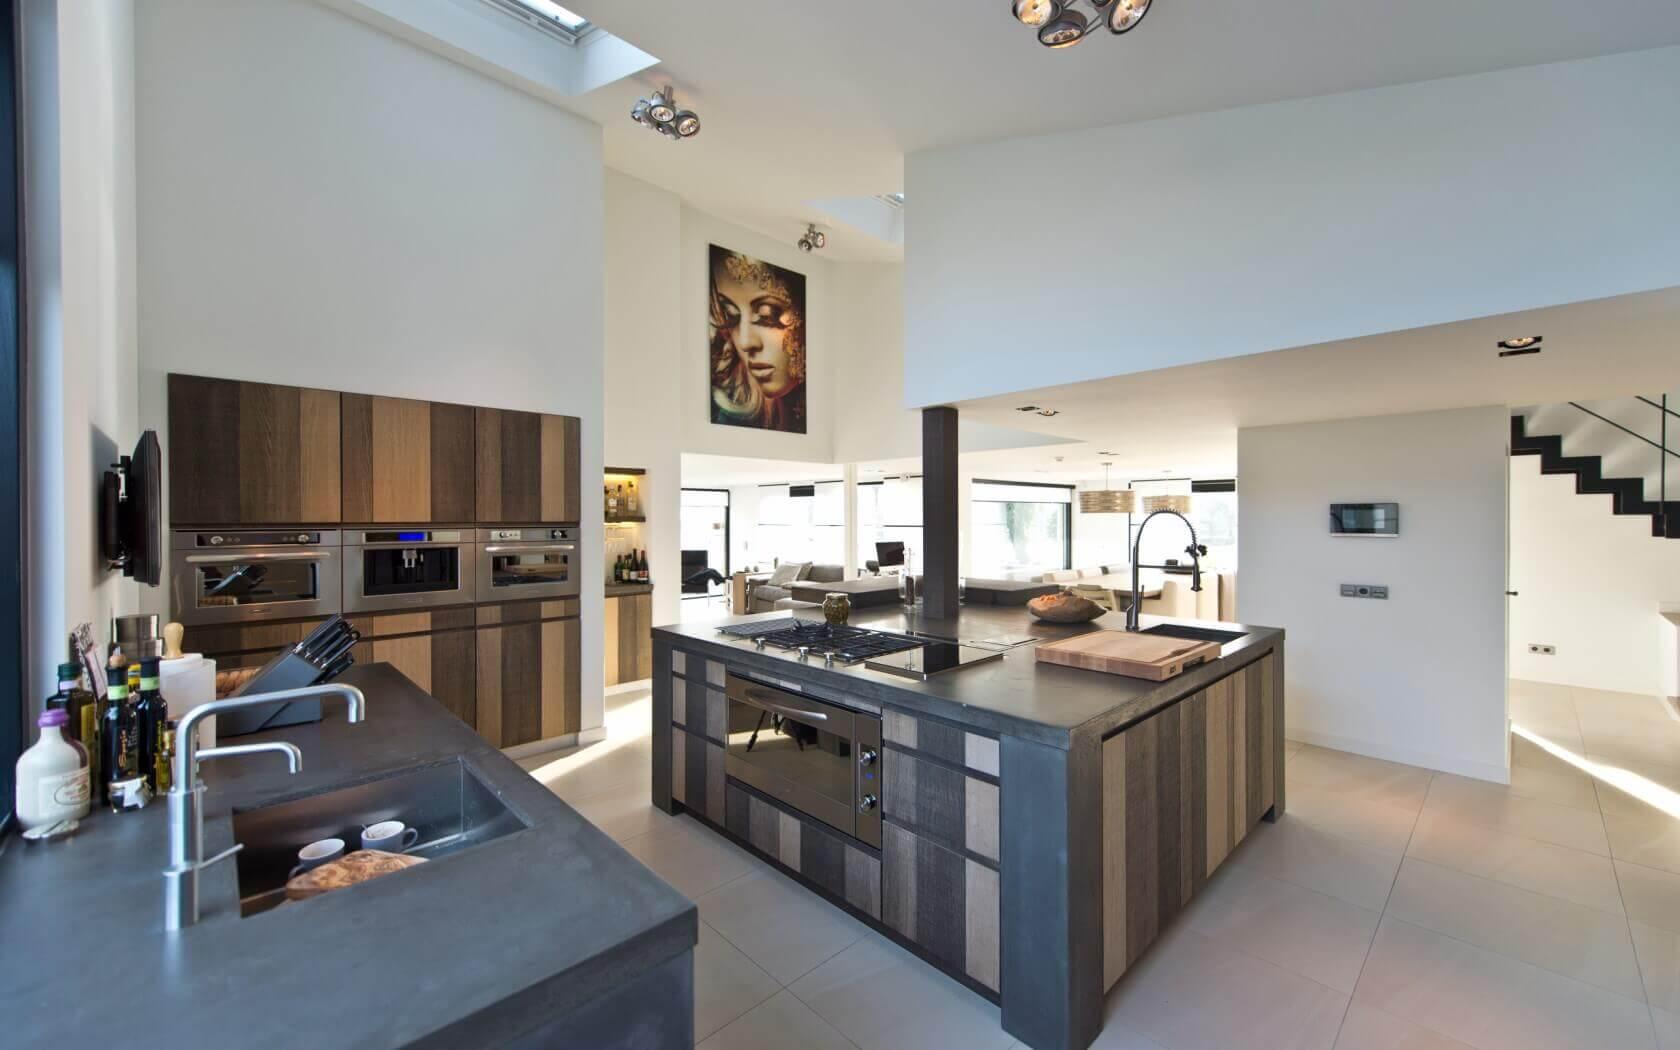 Houten handgemaakte keukens